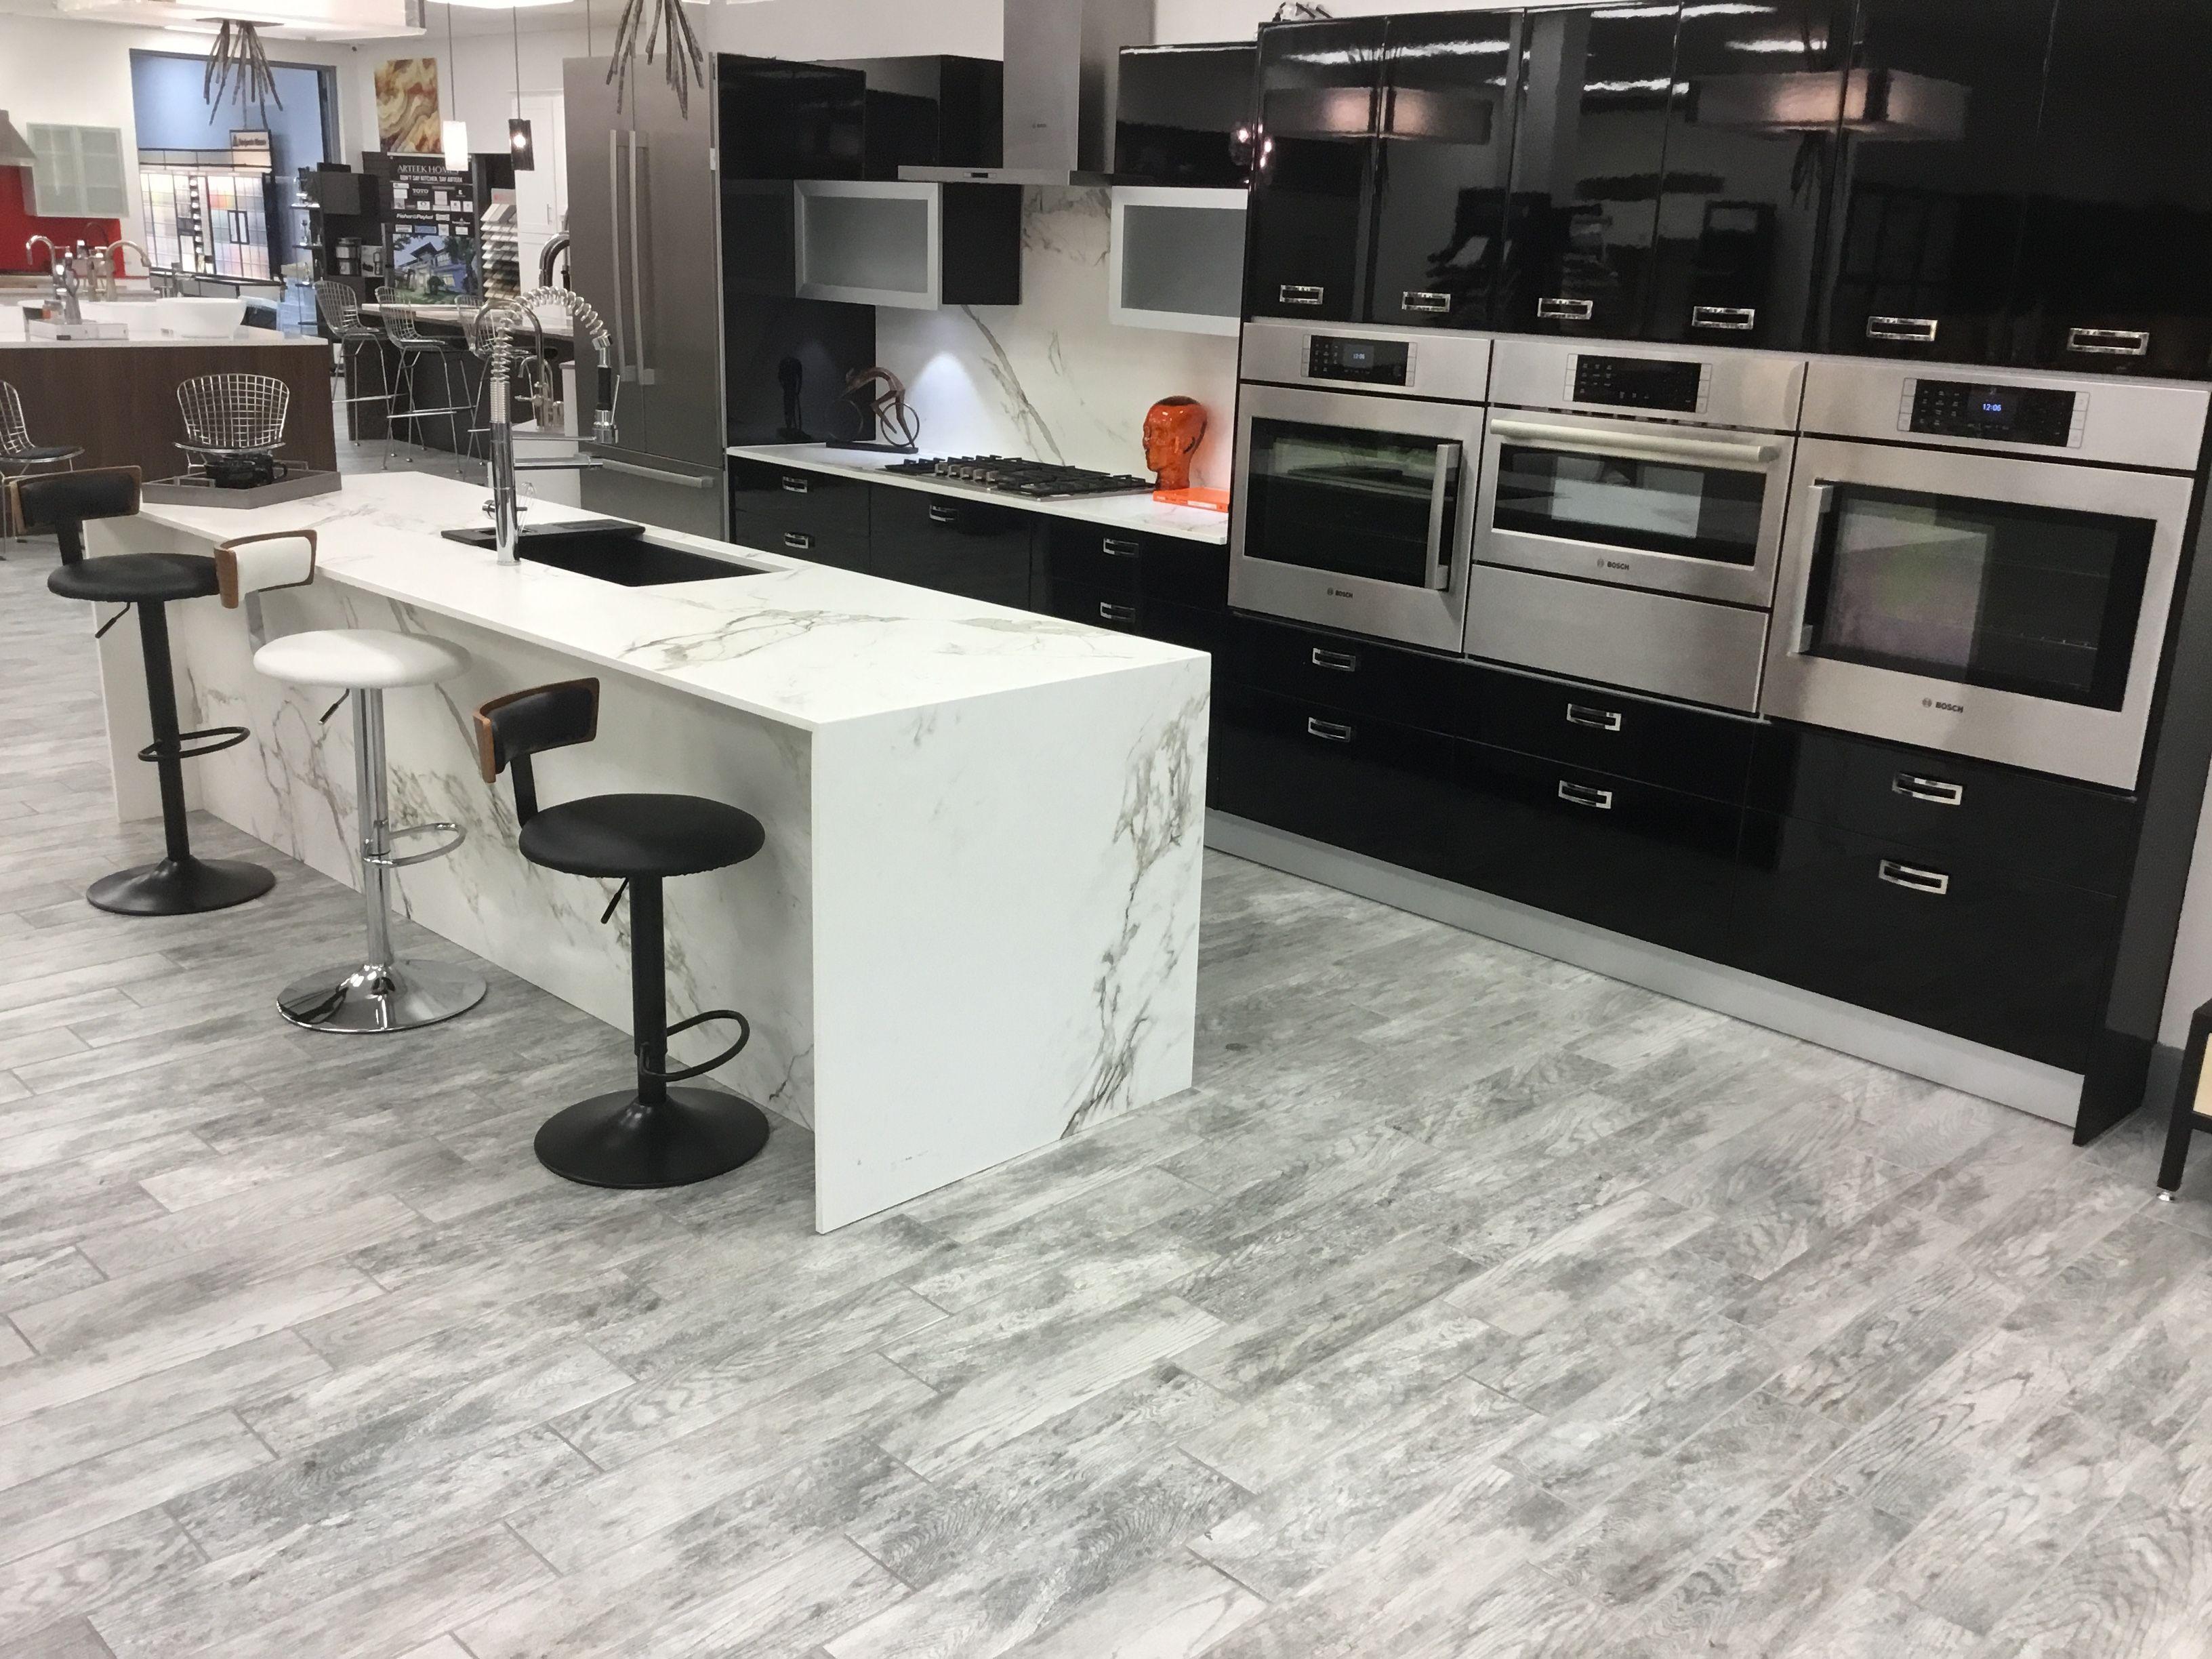 Designer Kitchen Cabinets Orlando Visit Arteek Supply And Design Showroom  Orlando 407 430 3030